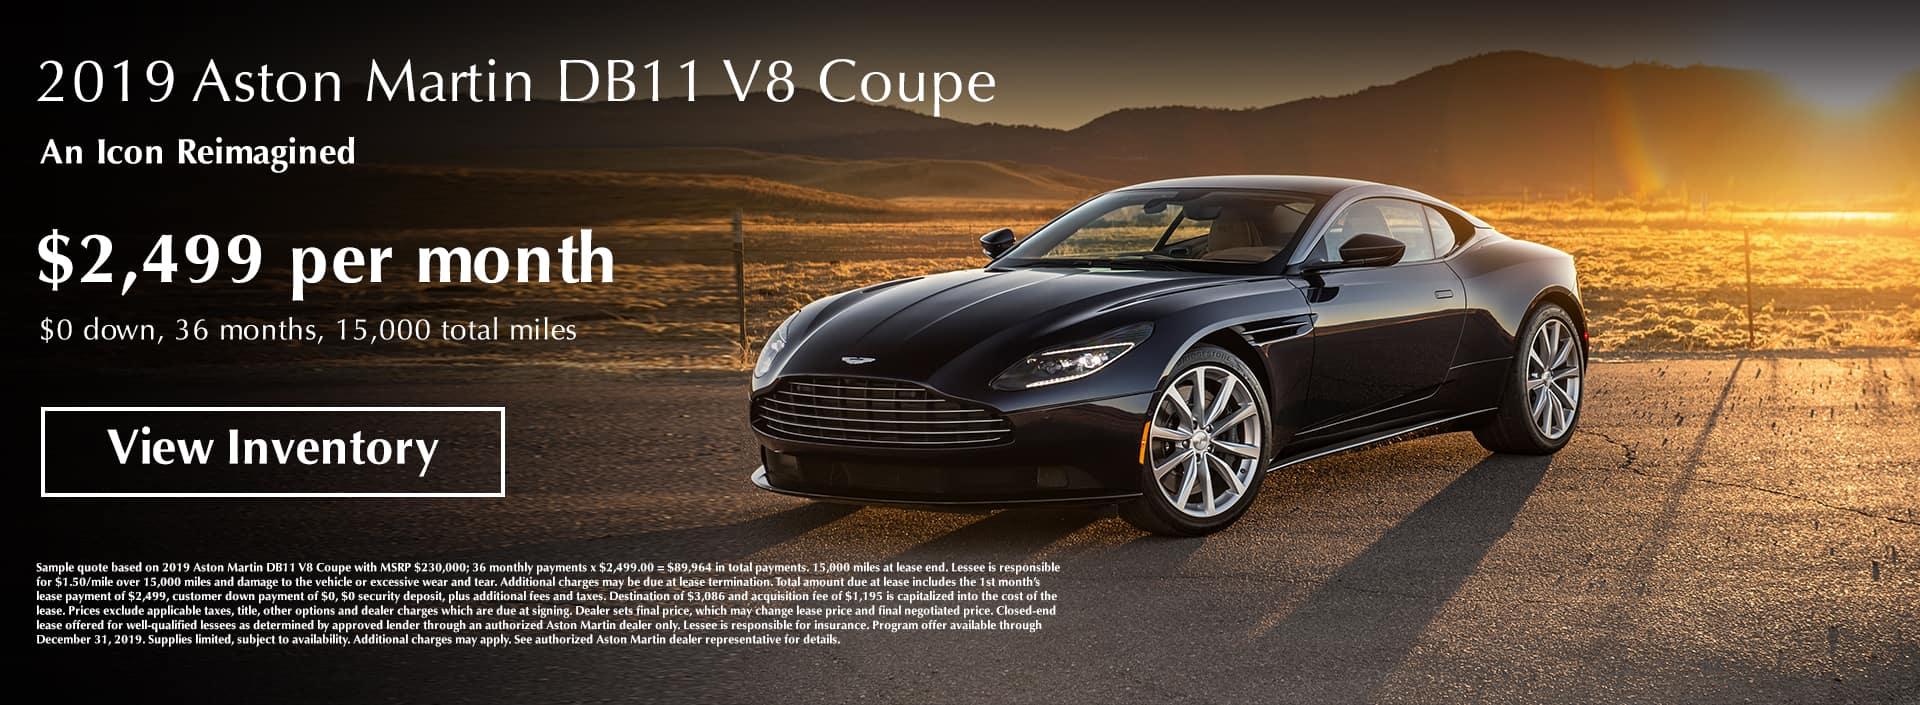 Aston Martin Houston Lease Offer